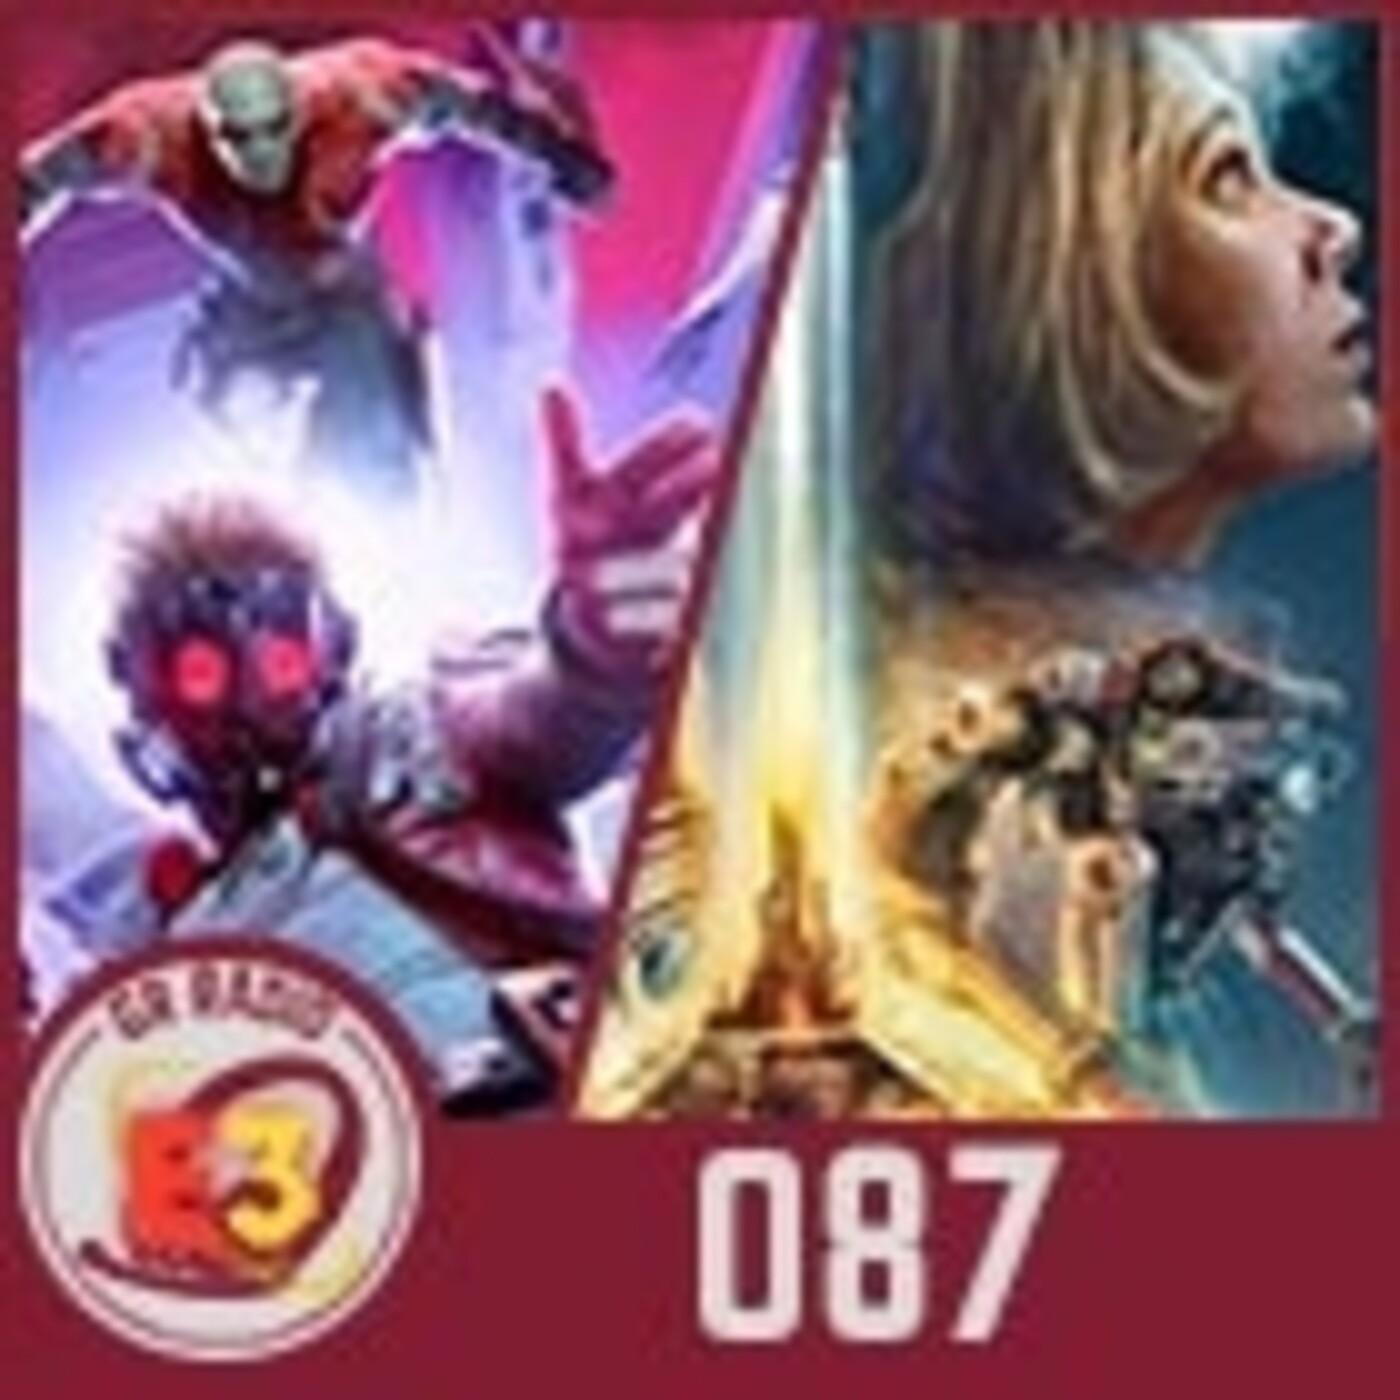 #E32021 GR (087) MICROSOFT saca músculo | SQUARE ENIX apuesta a ganador